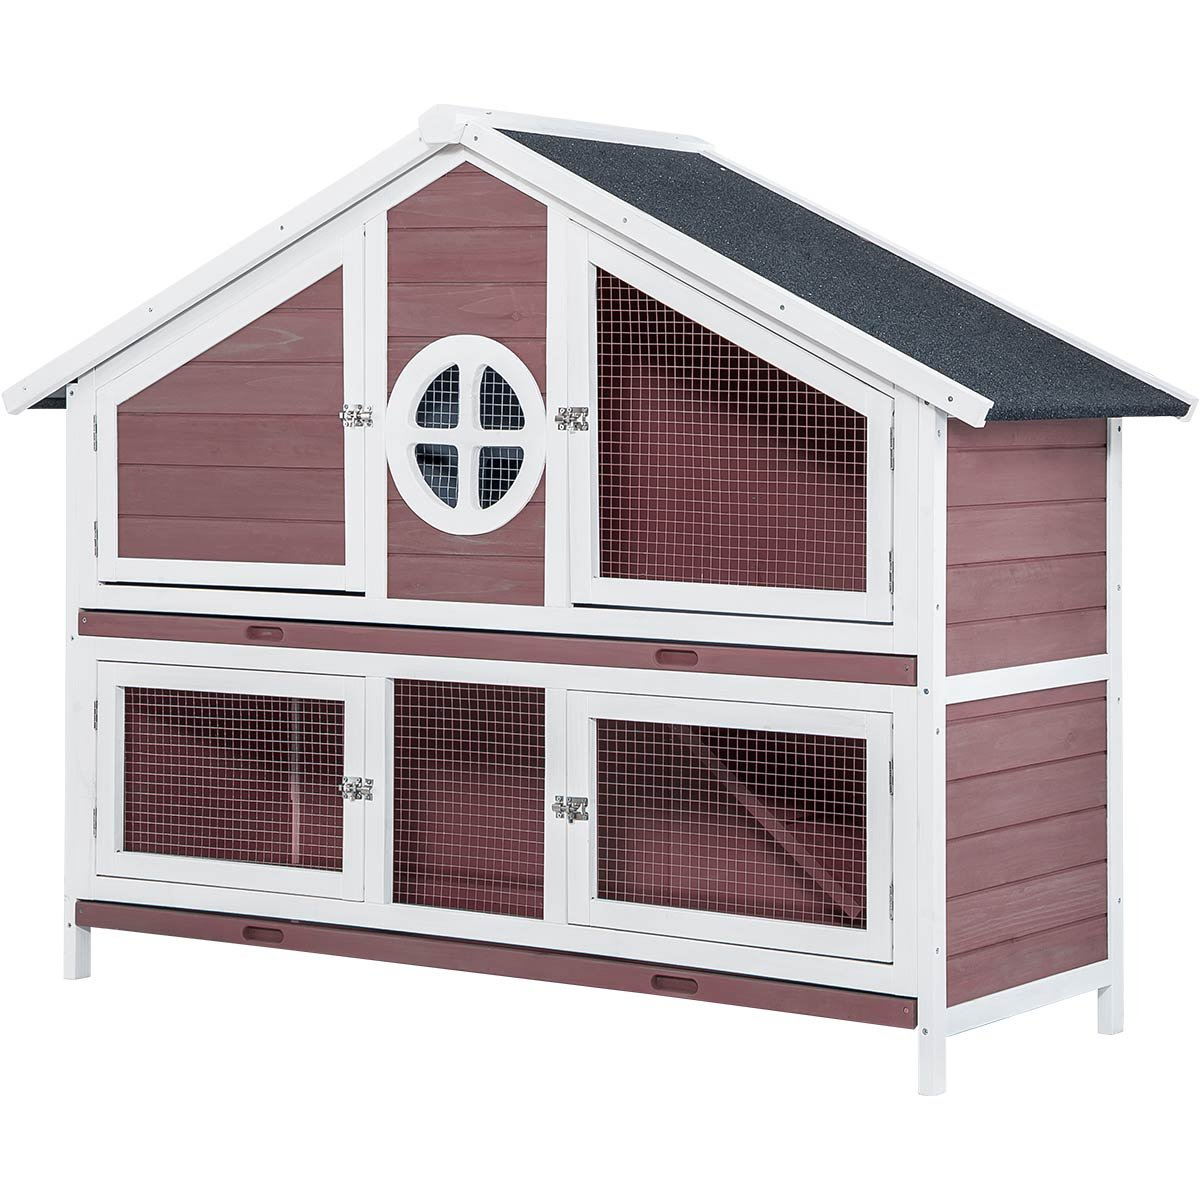 LZ LEISURE ZONE Purlove Rabbit Hutch Wood House Pet Cage for Small Animals (Rabbit Hutch #3)